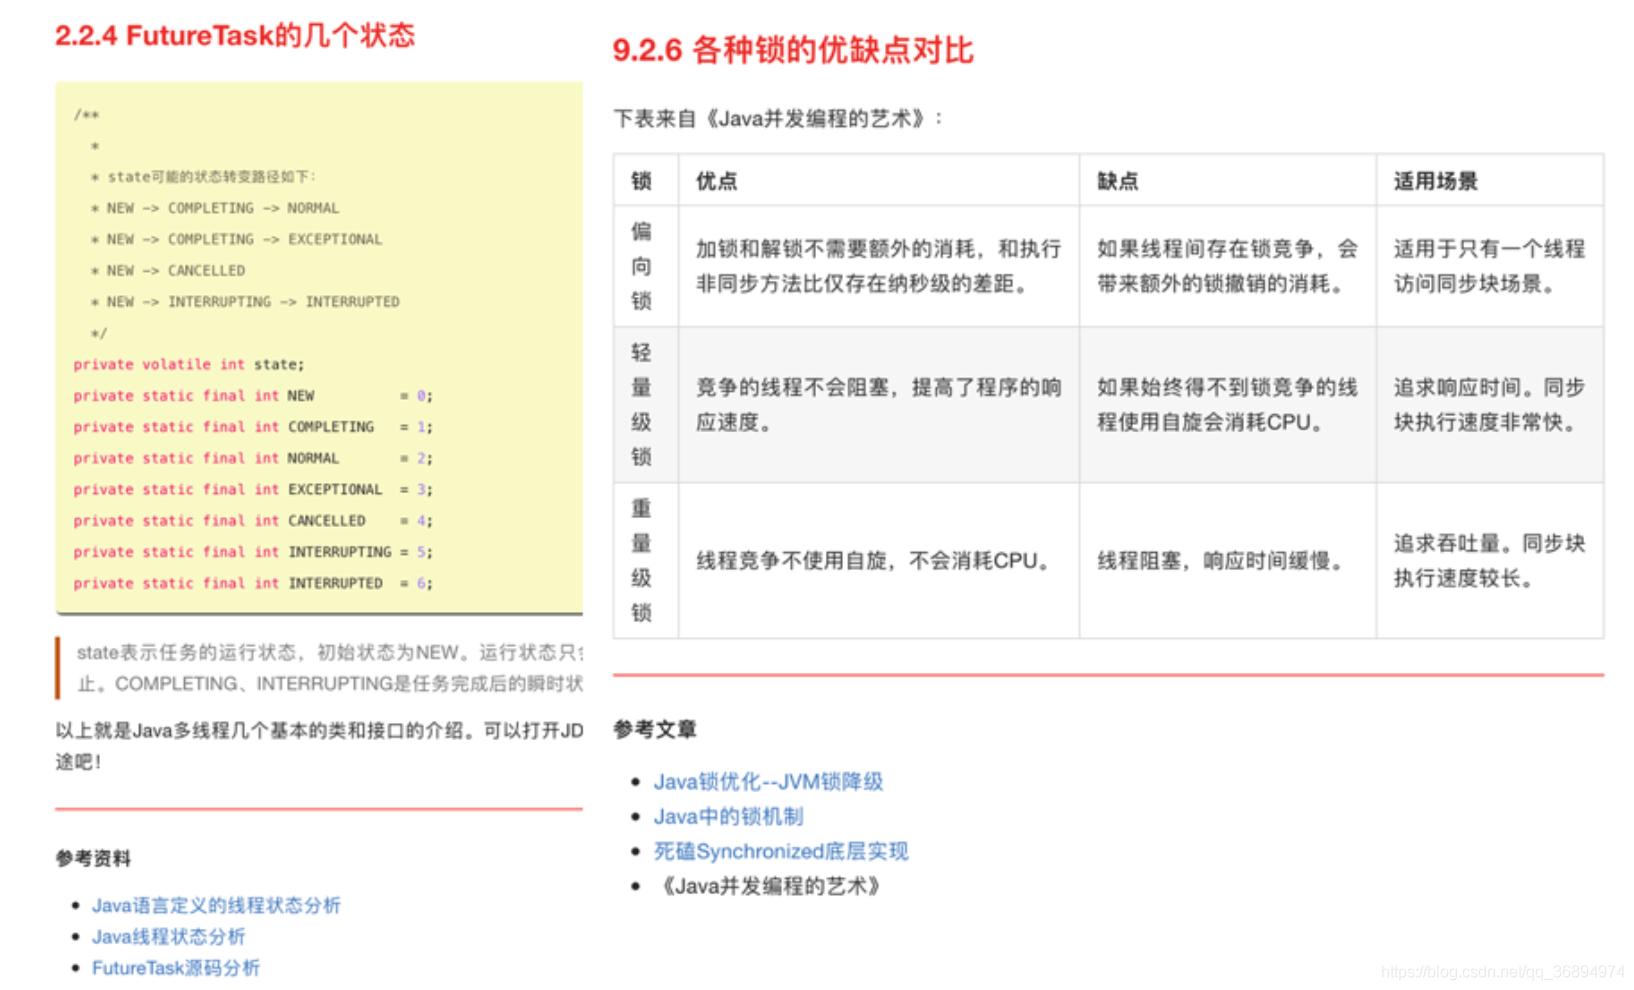 [外链图片转存失败,源站可能有防盗链机制,建议将图片保存下来直接上传(img-gdrLbv1q-1585445429785)(/Users/mr.l/Library/Application Support/typora-user-images/image-20200328050310648.png)]